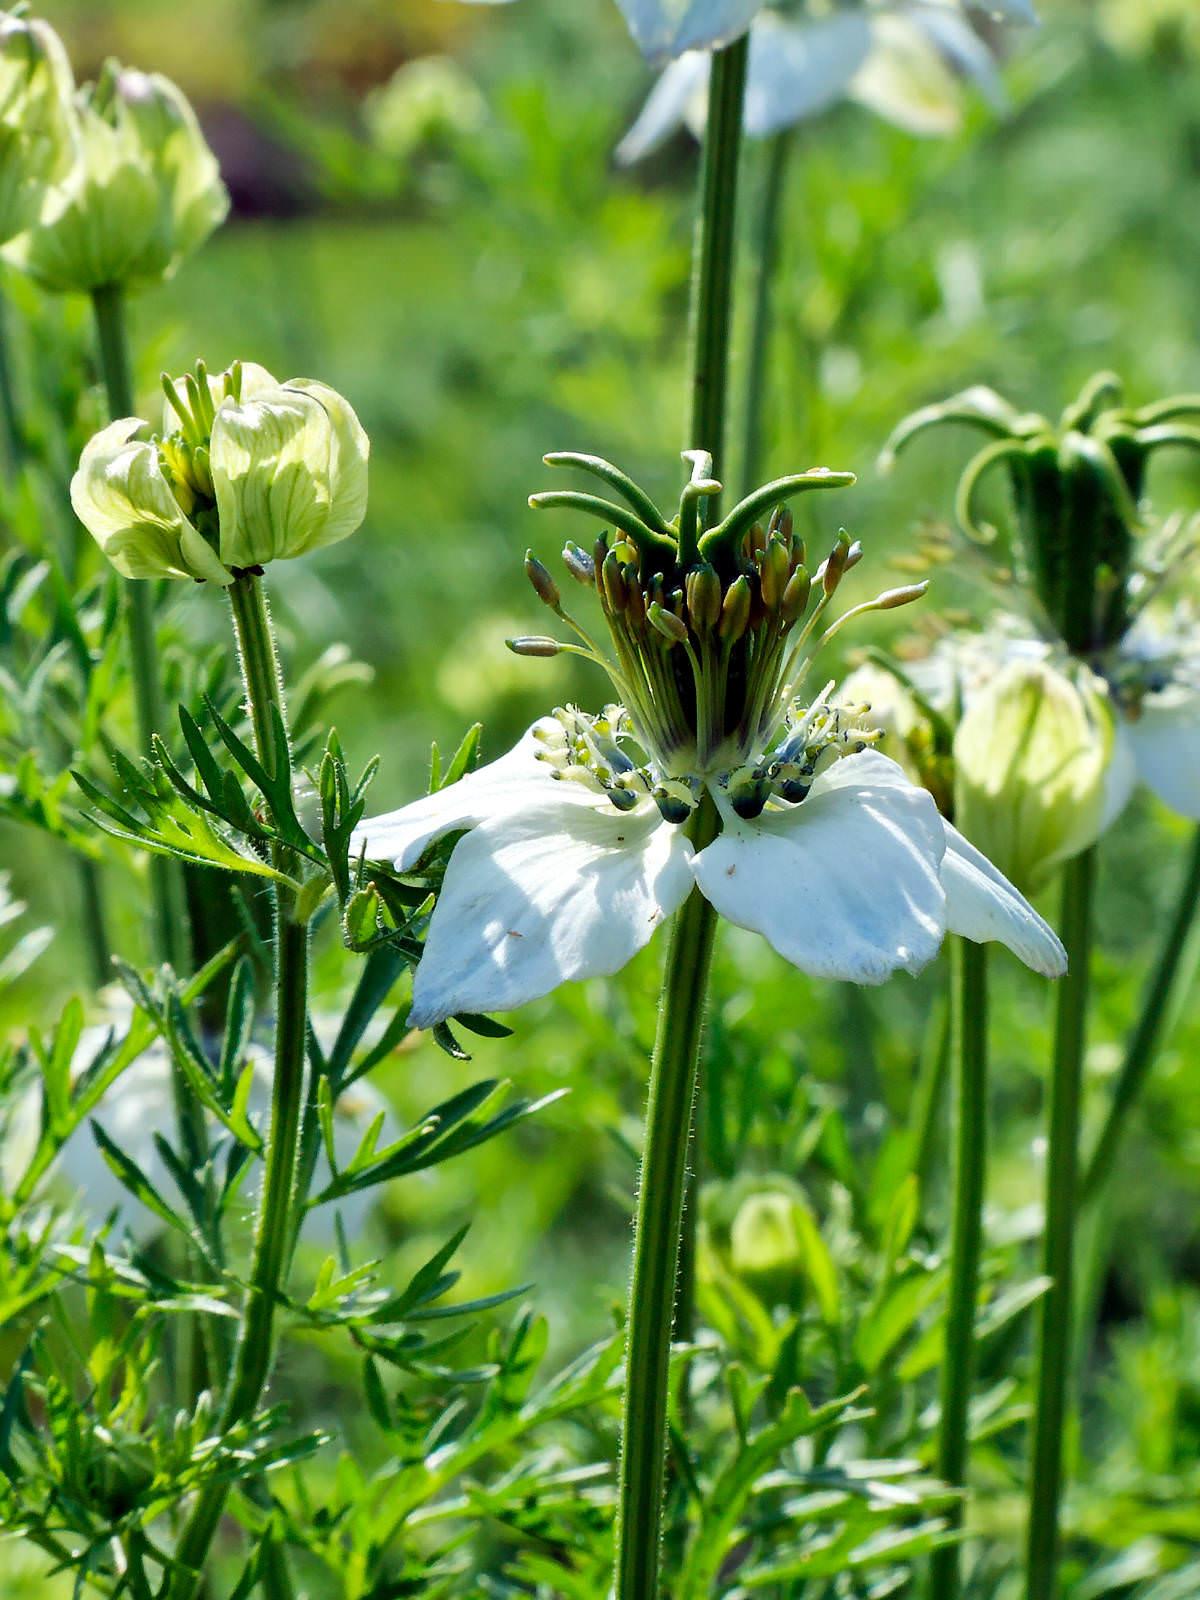 Nigella sativa - Black Cumin | World of Flowering Plants